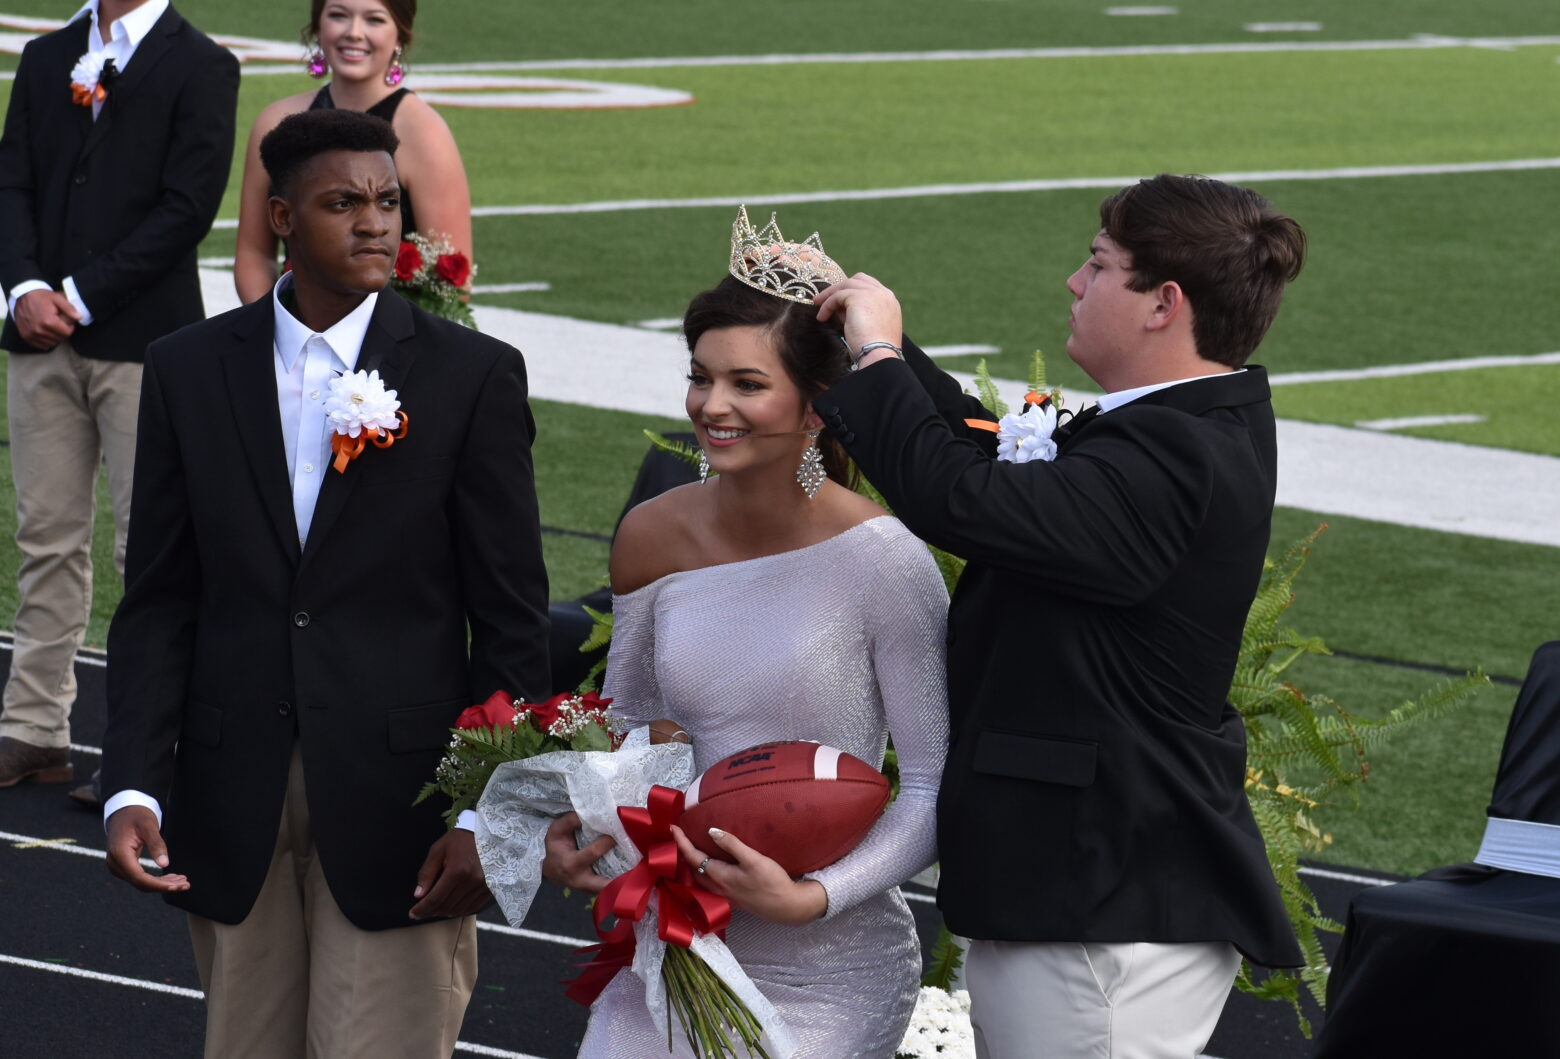 Keller Bigham crowned 2021 WHS Homecoming Queen